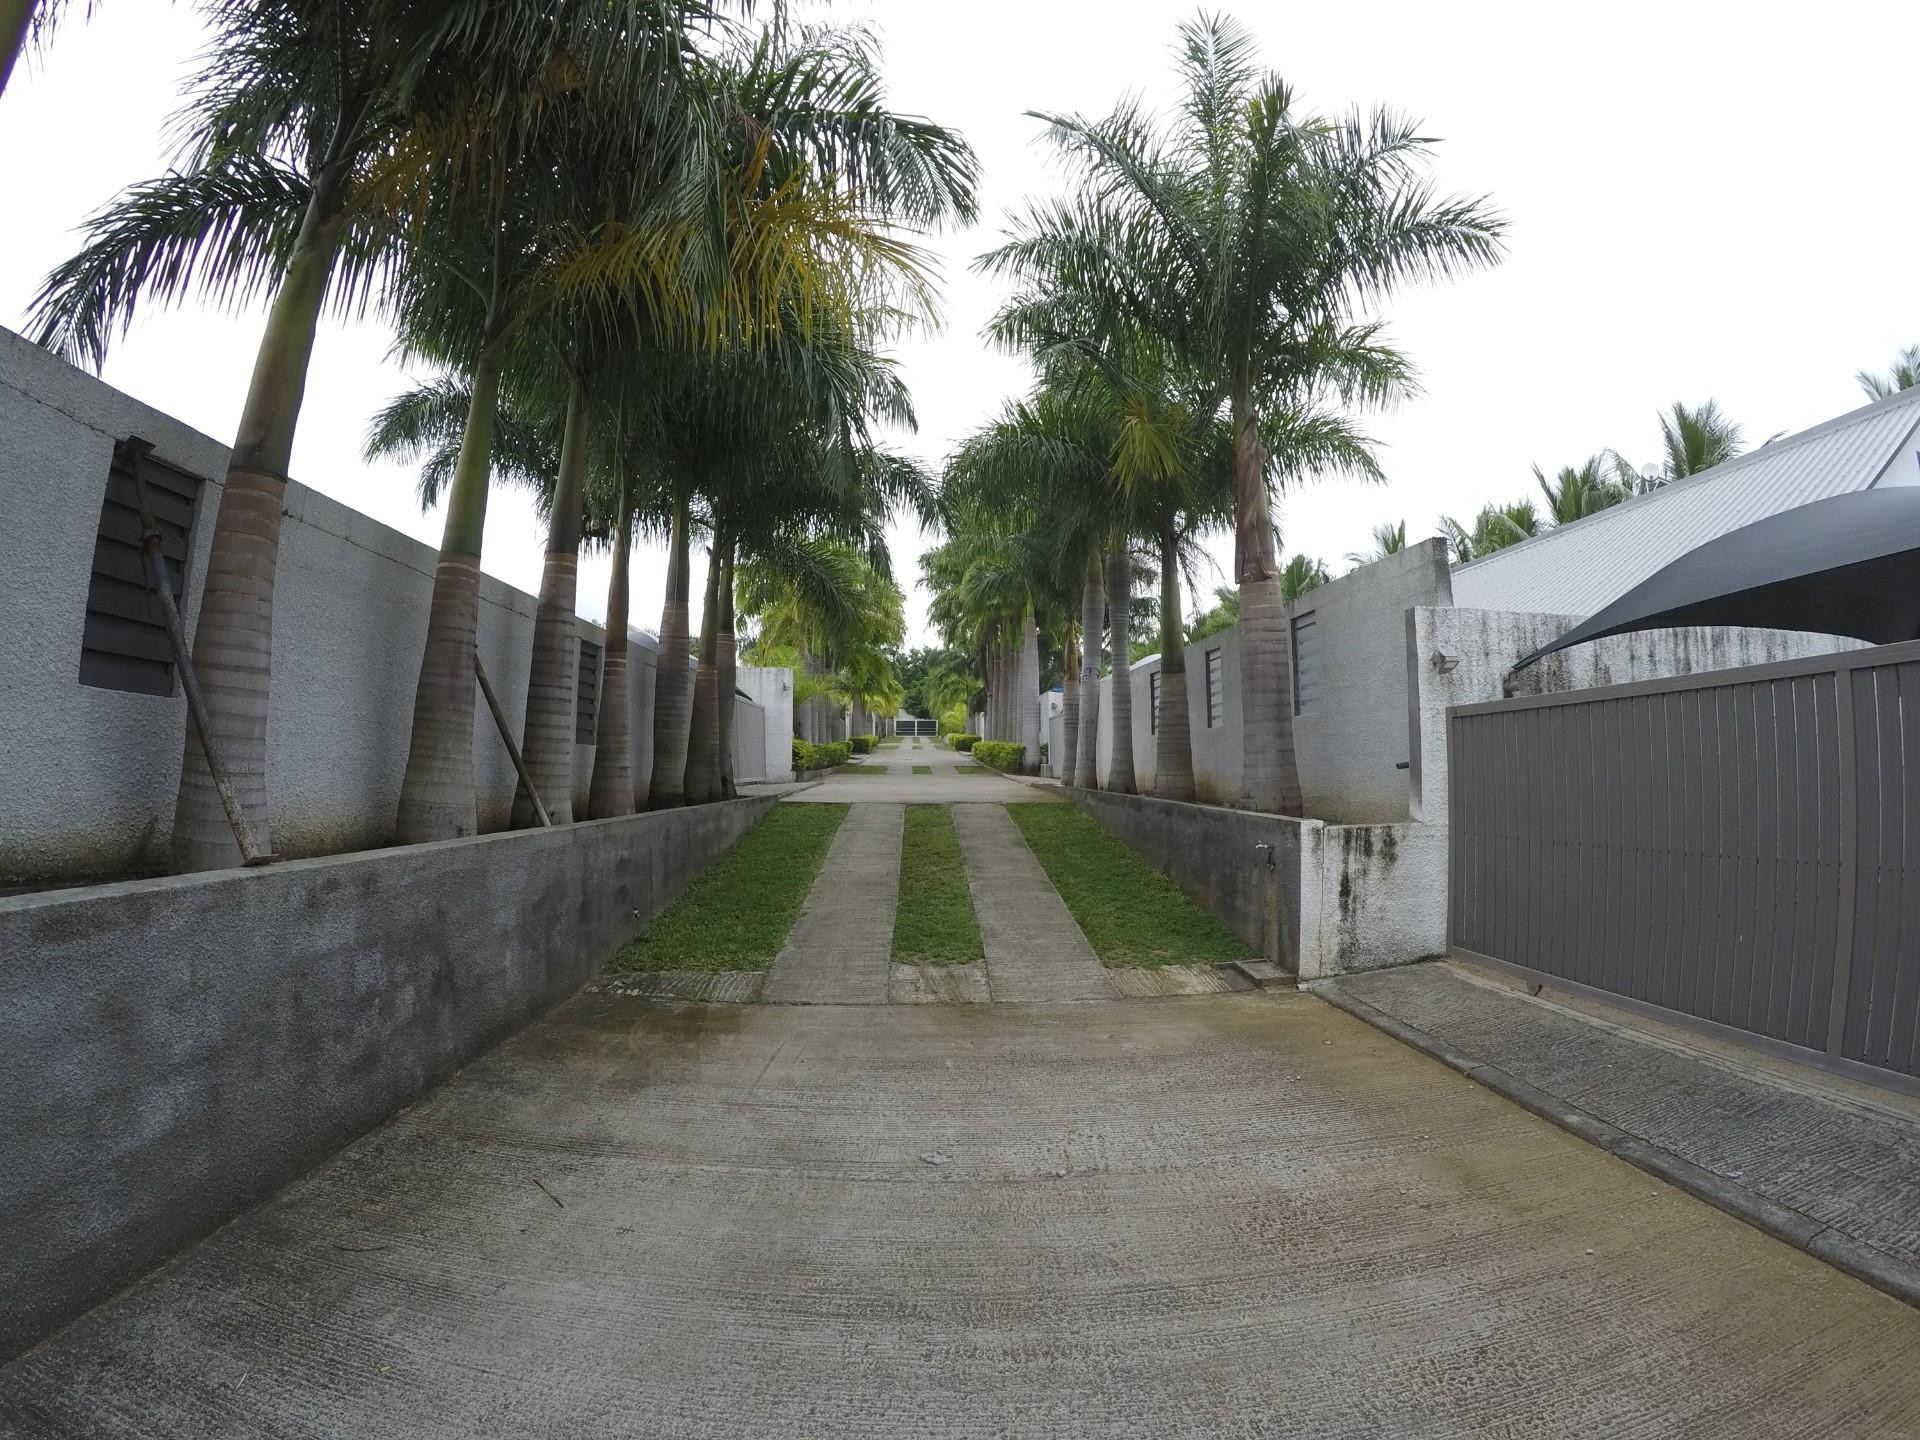 3 Bedroom House To Rent in Tamarin